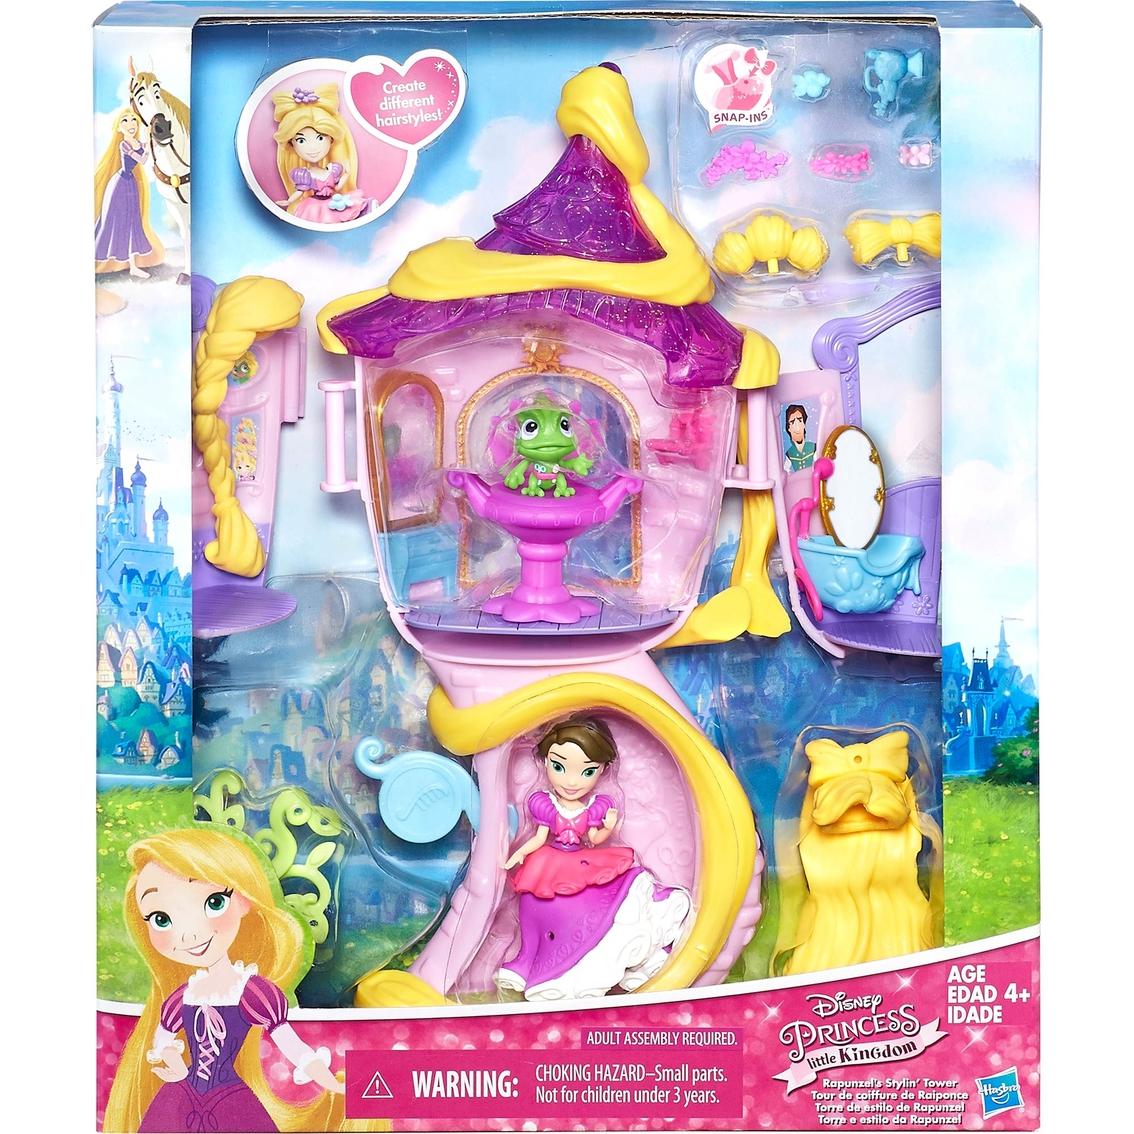 Hasbro Disney Princess Little Kingdom Rapunzel's Stylin' Tower